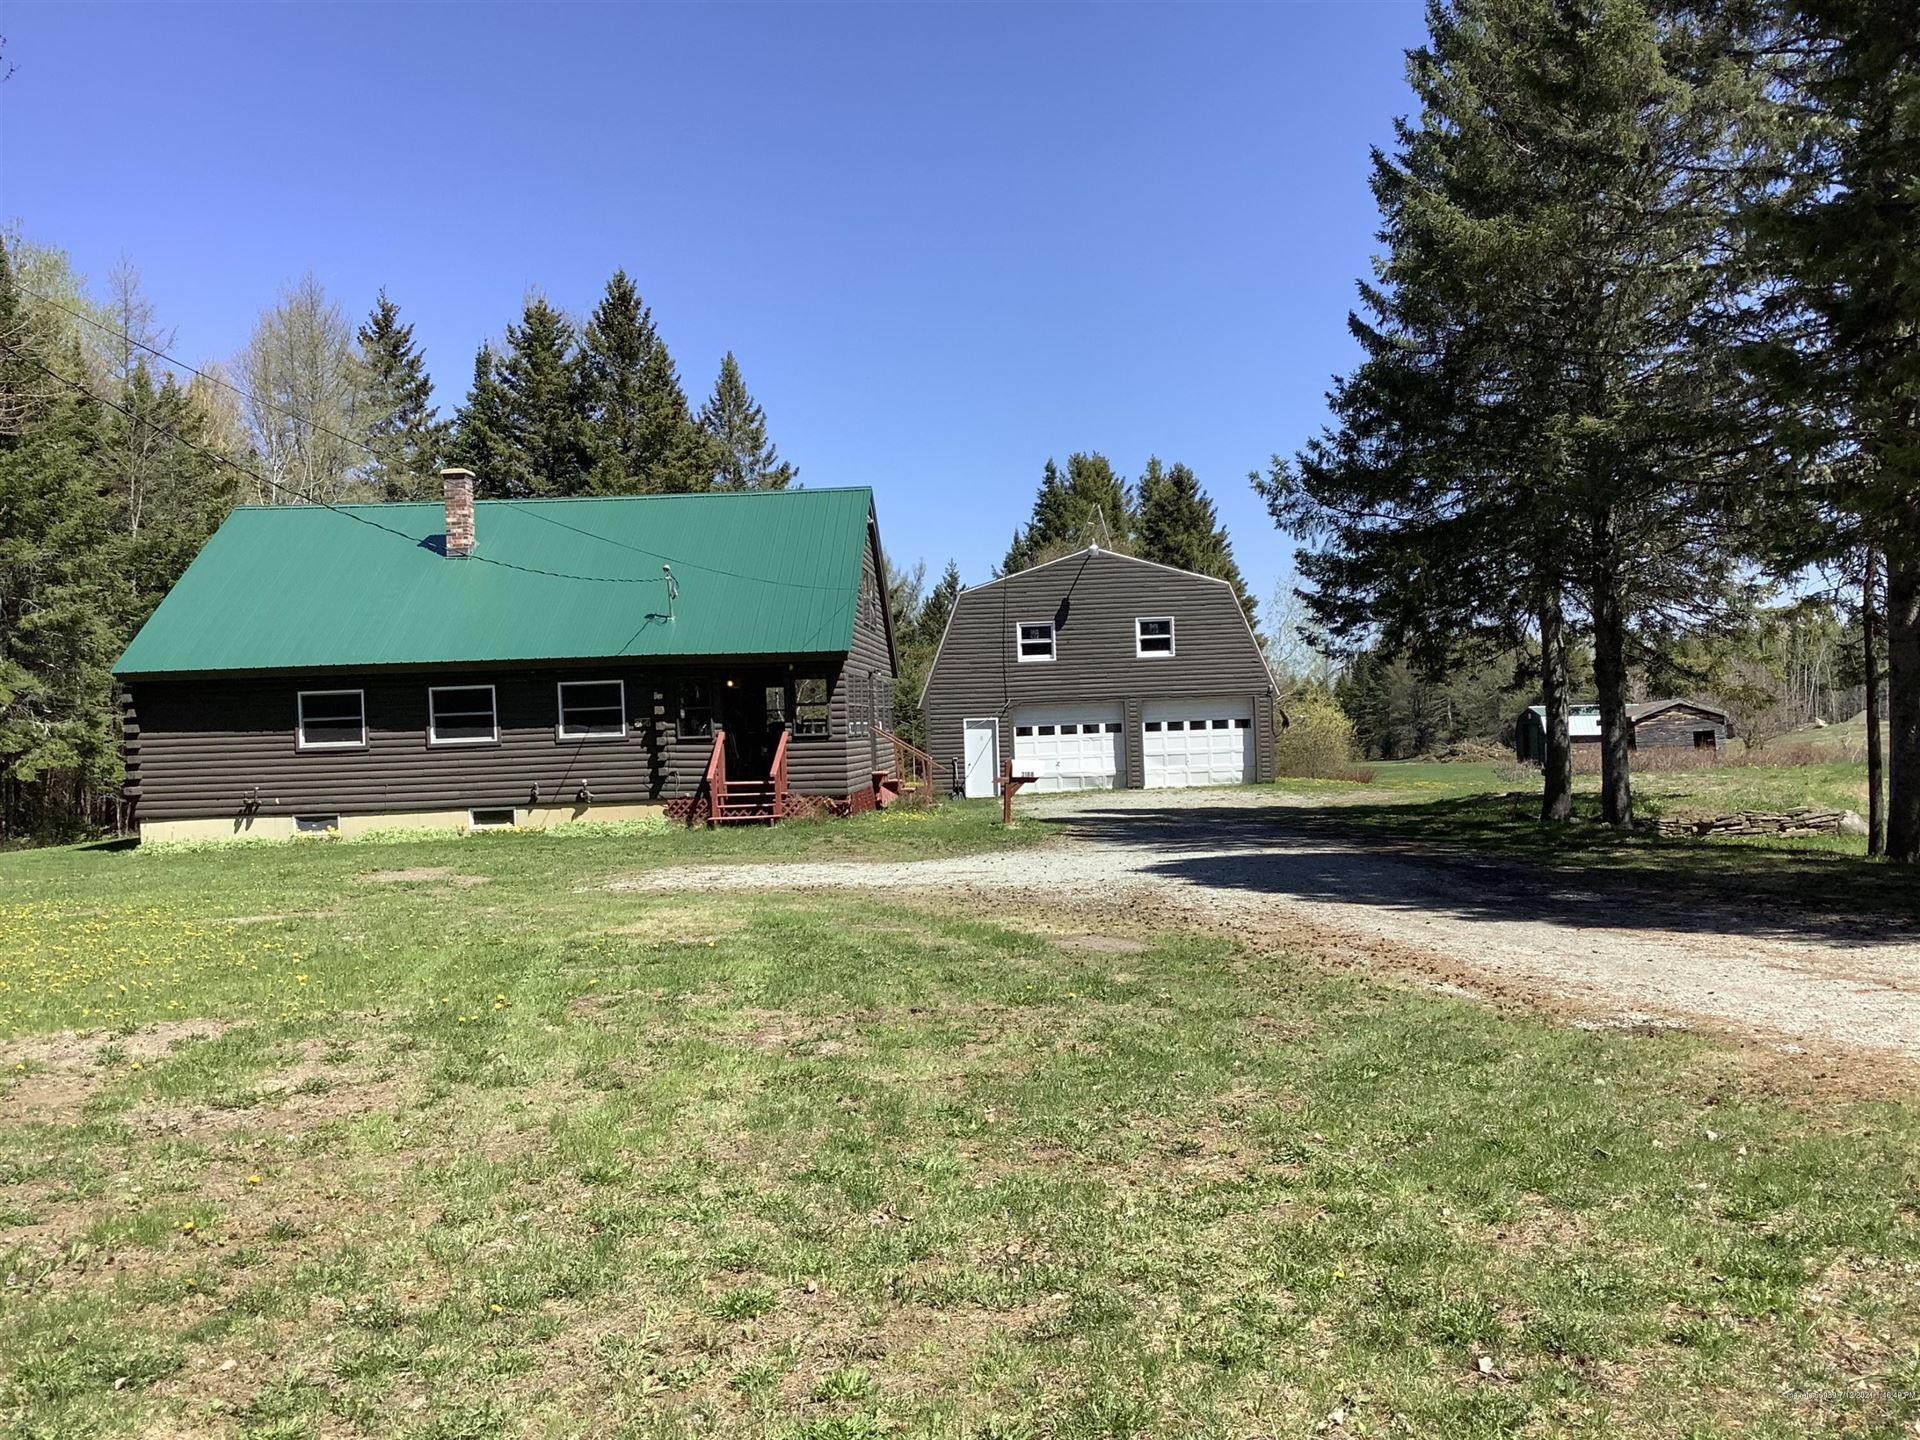 Photo of 3188 Portage Road, Portage Lake, ME 04768 (MLS # 1489638)